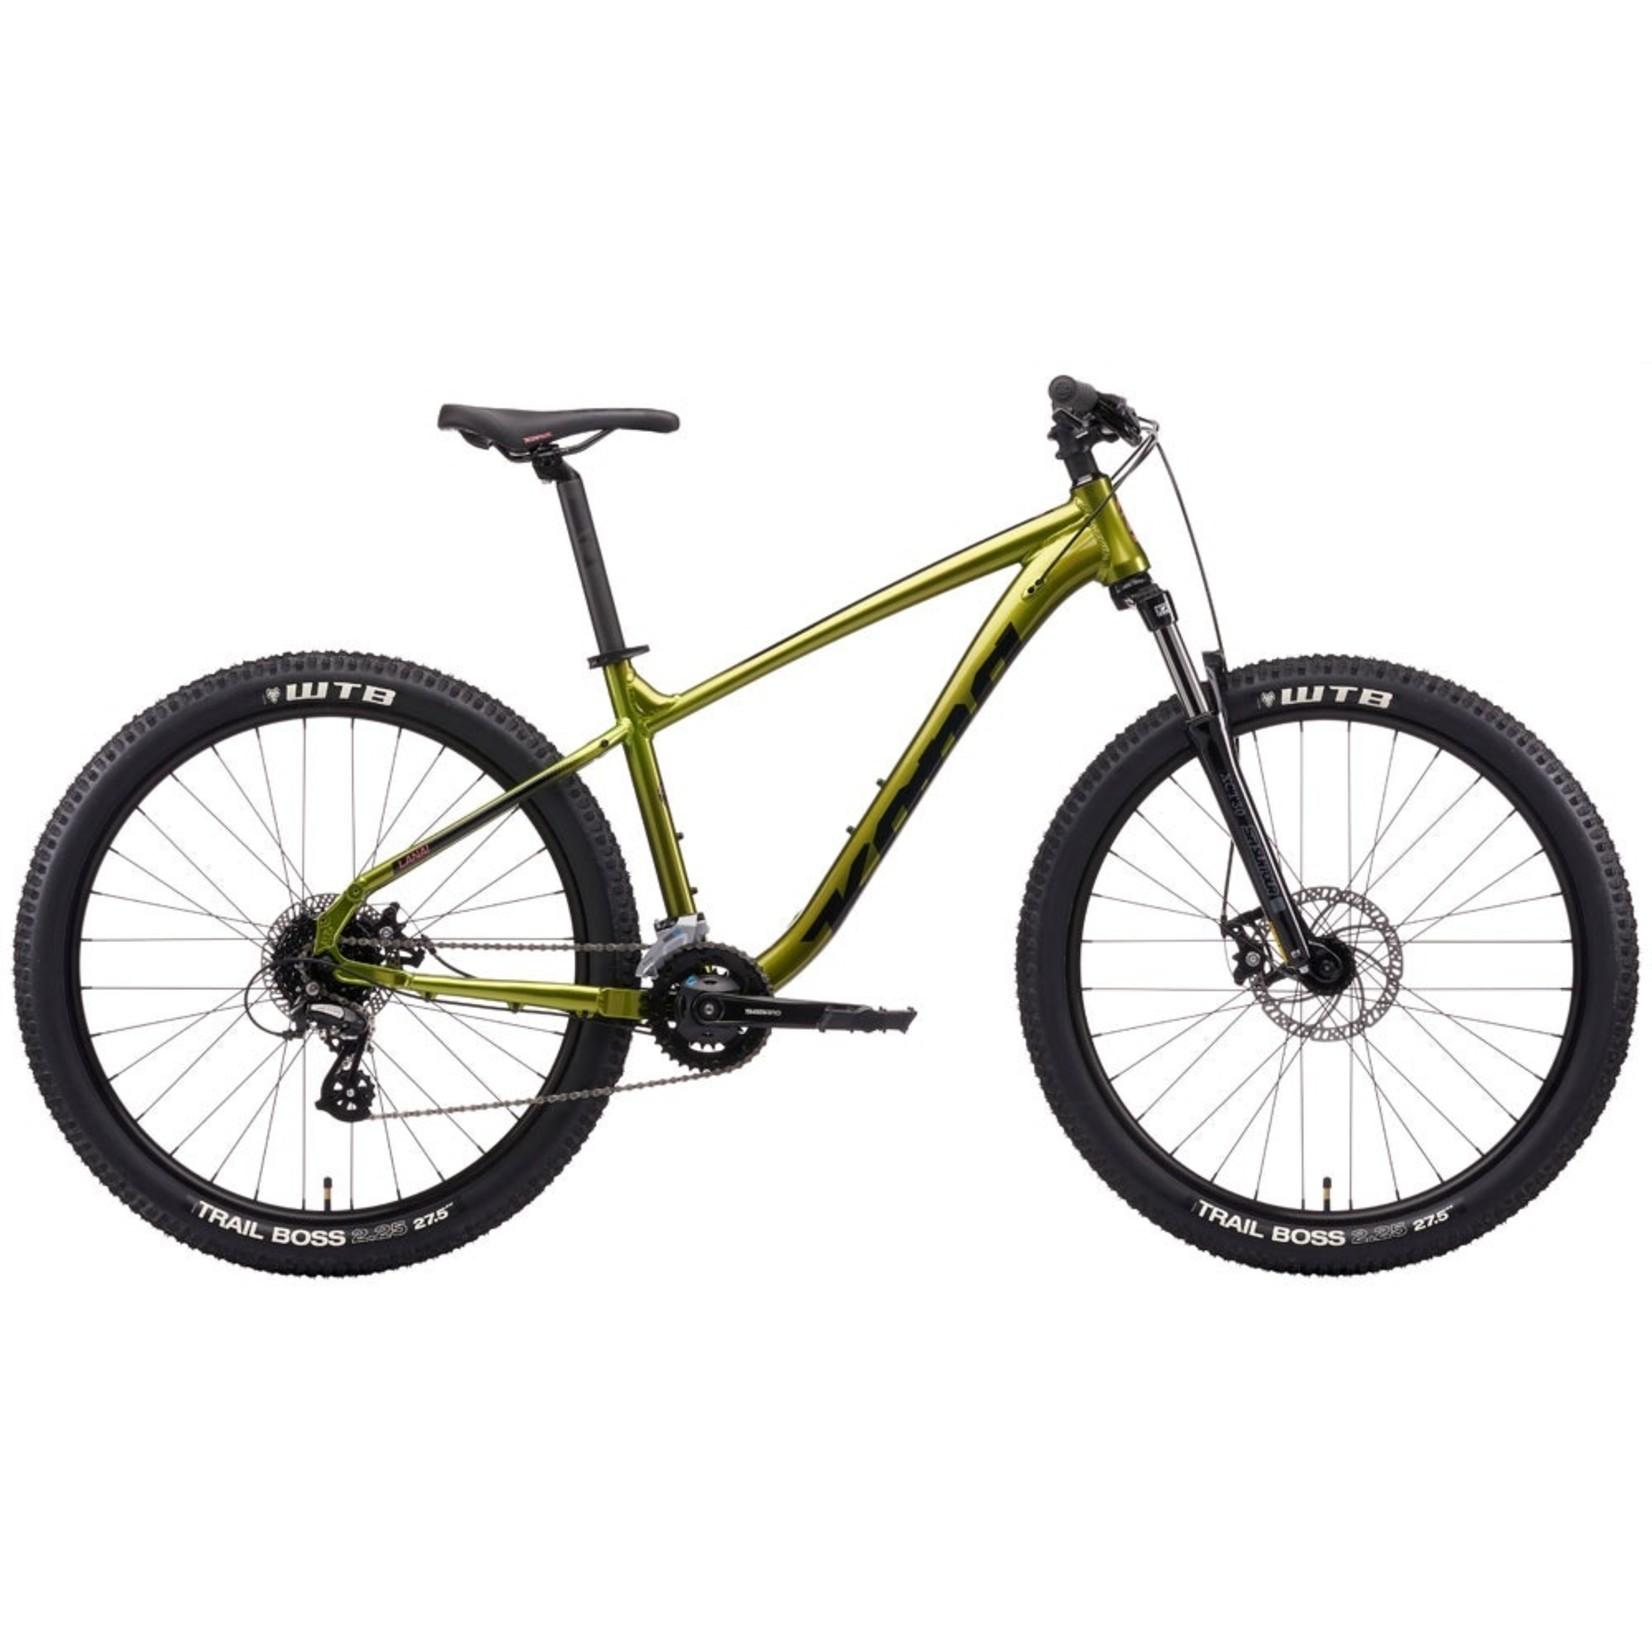 Kona Bikes 2021 Kona, Lana'I Green